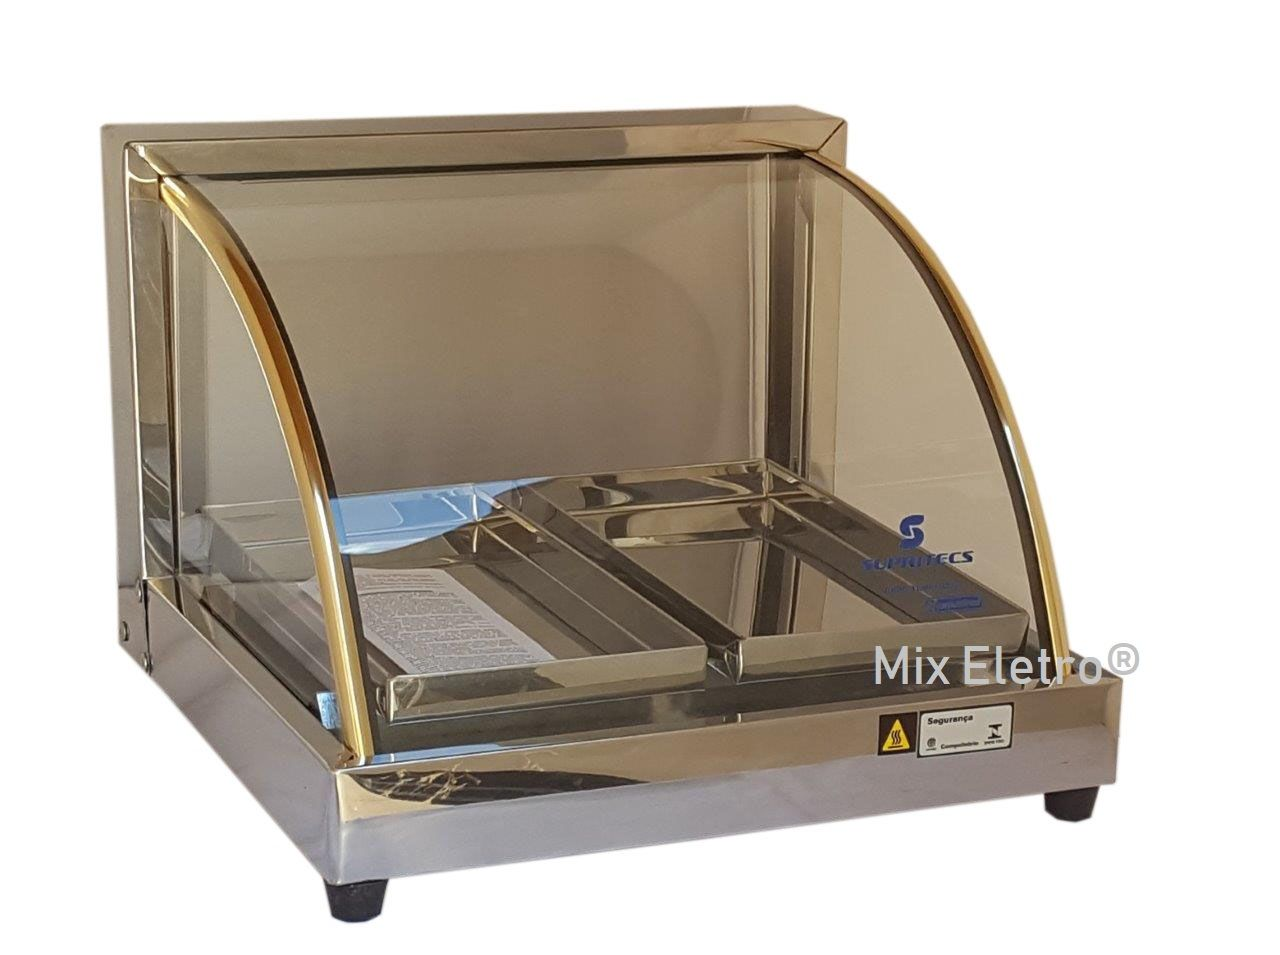 Estufa de salgados elétrica 37cm com 2 Bandejas Supritecs  - Mix Eletro